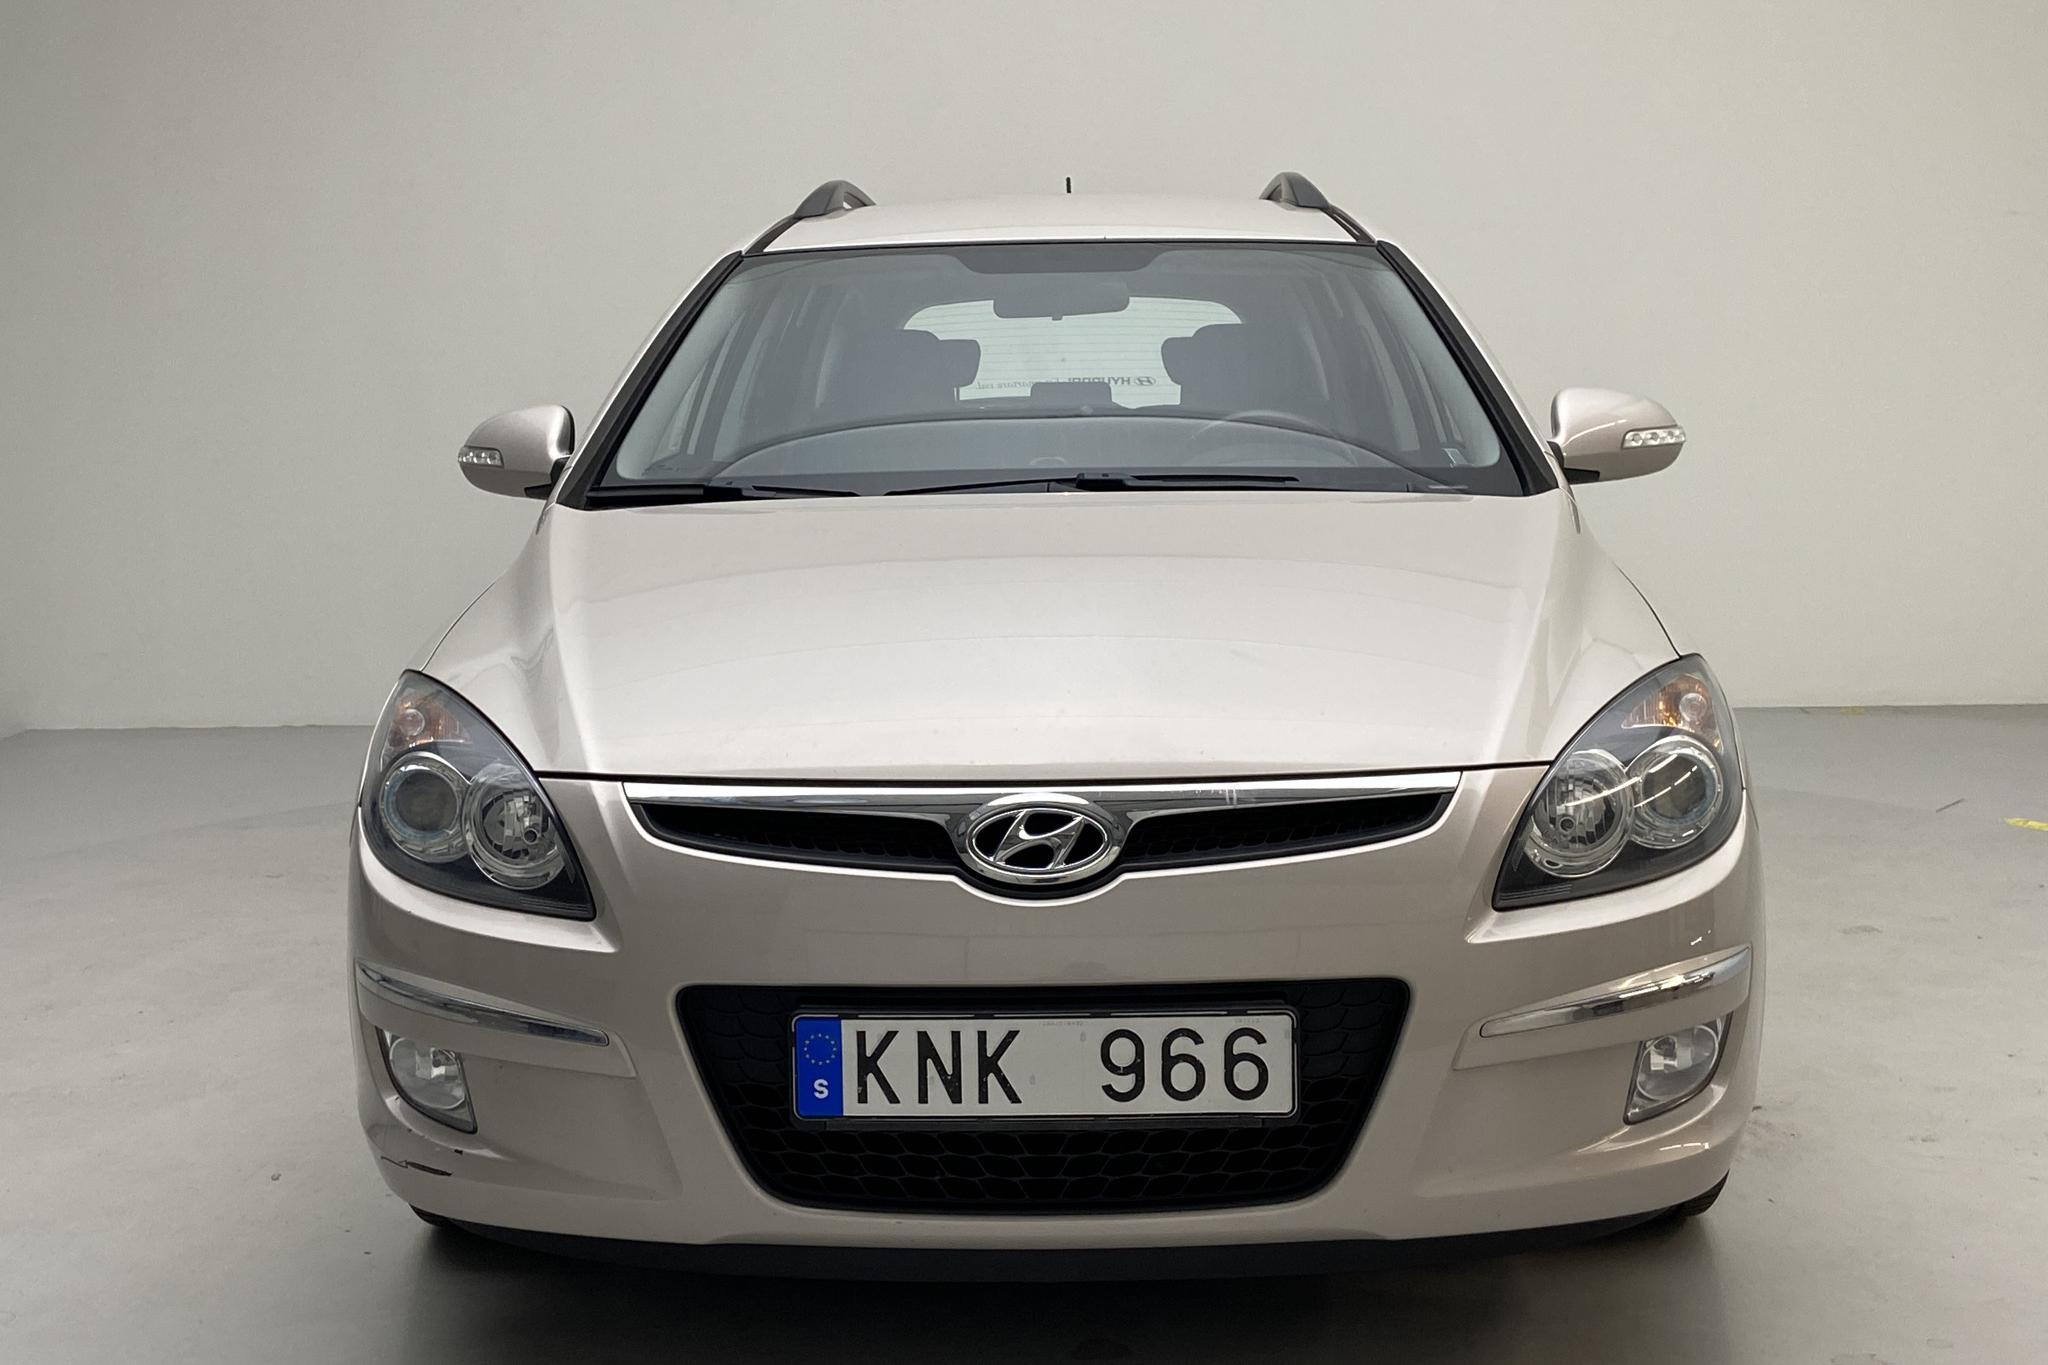 Hyundai i30 1.6 Kombi (122hk) - 117 800 km - Manual - Light Brown - 2010